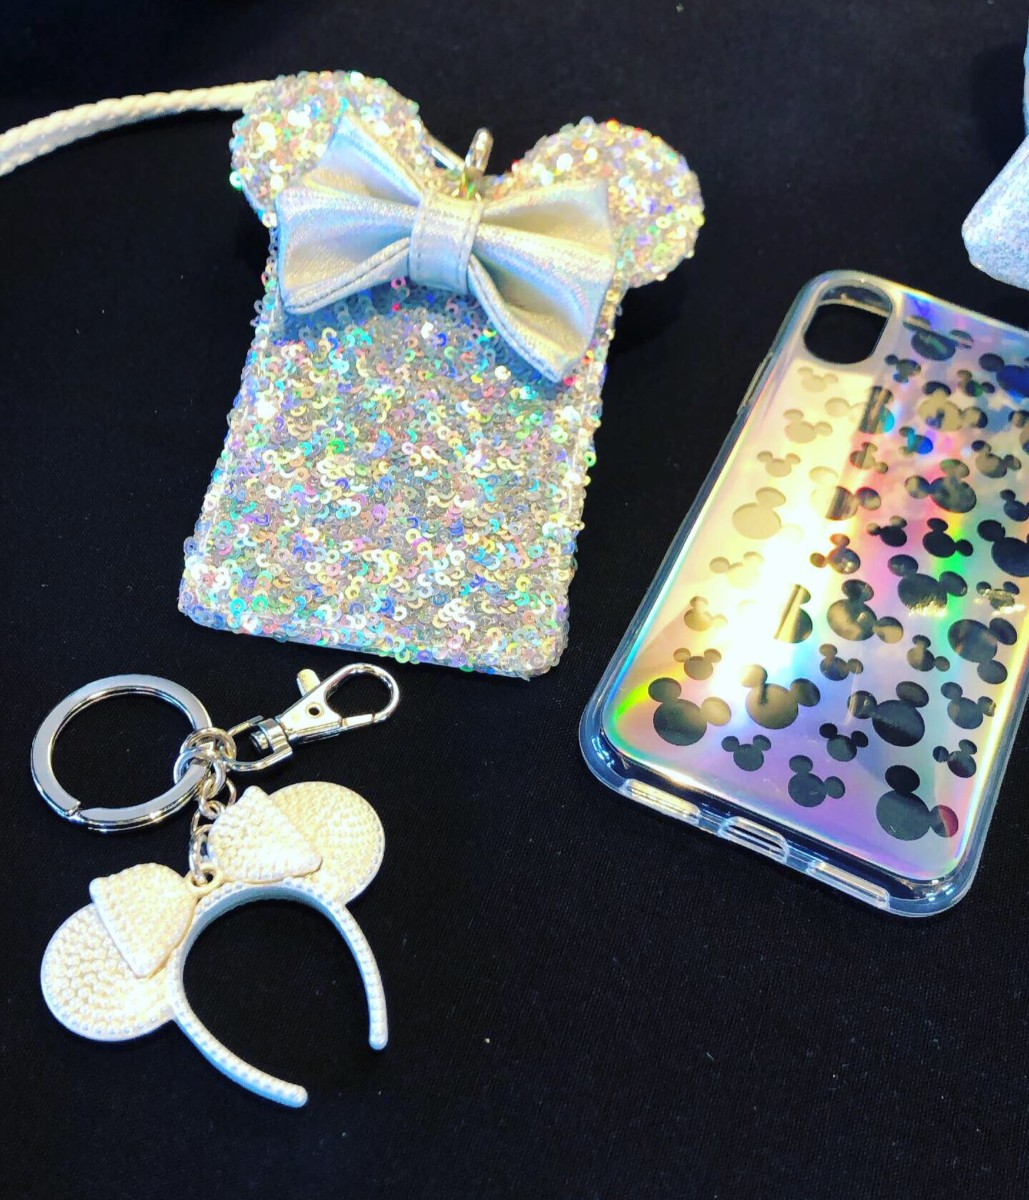 Imagination Pink & Magic Mirror Metallic Merch Coming Soon! #disneyspringssummer 5